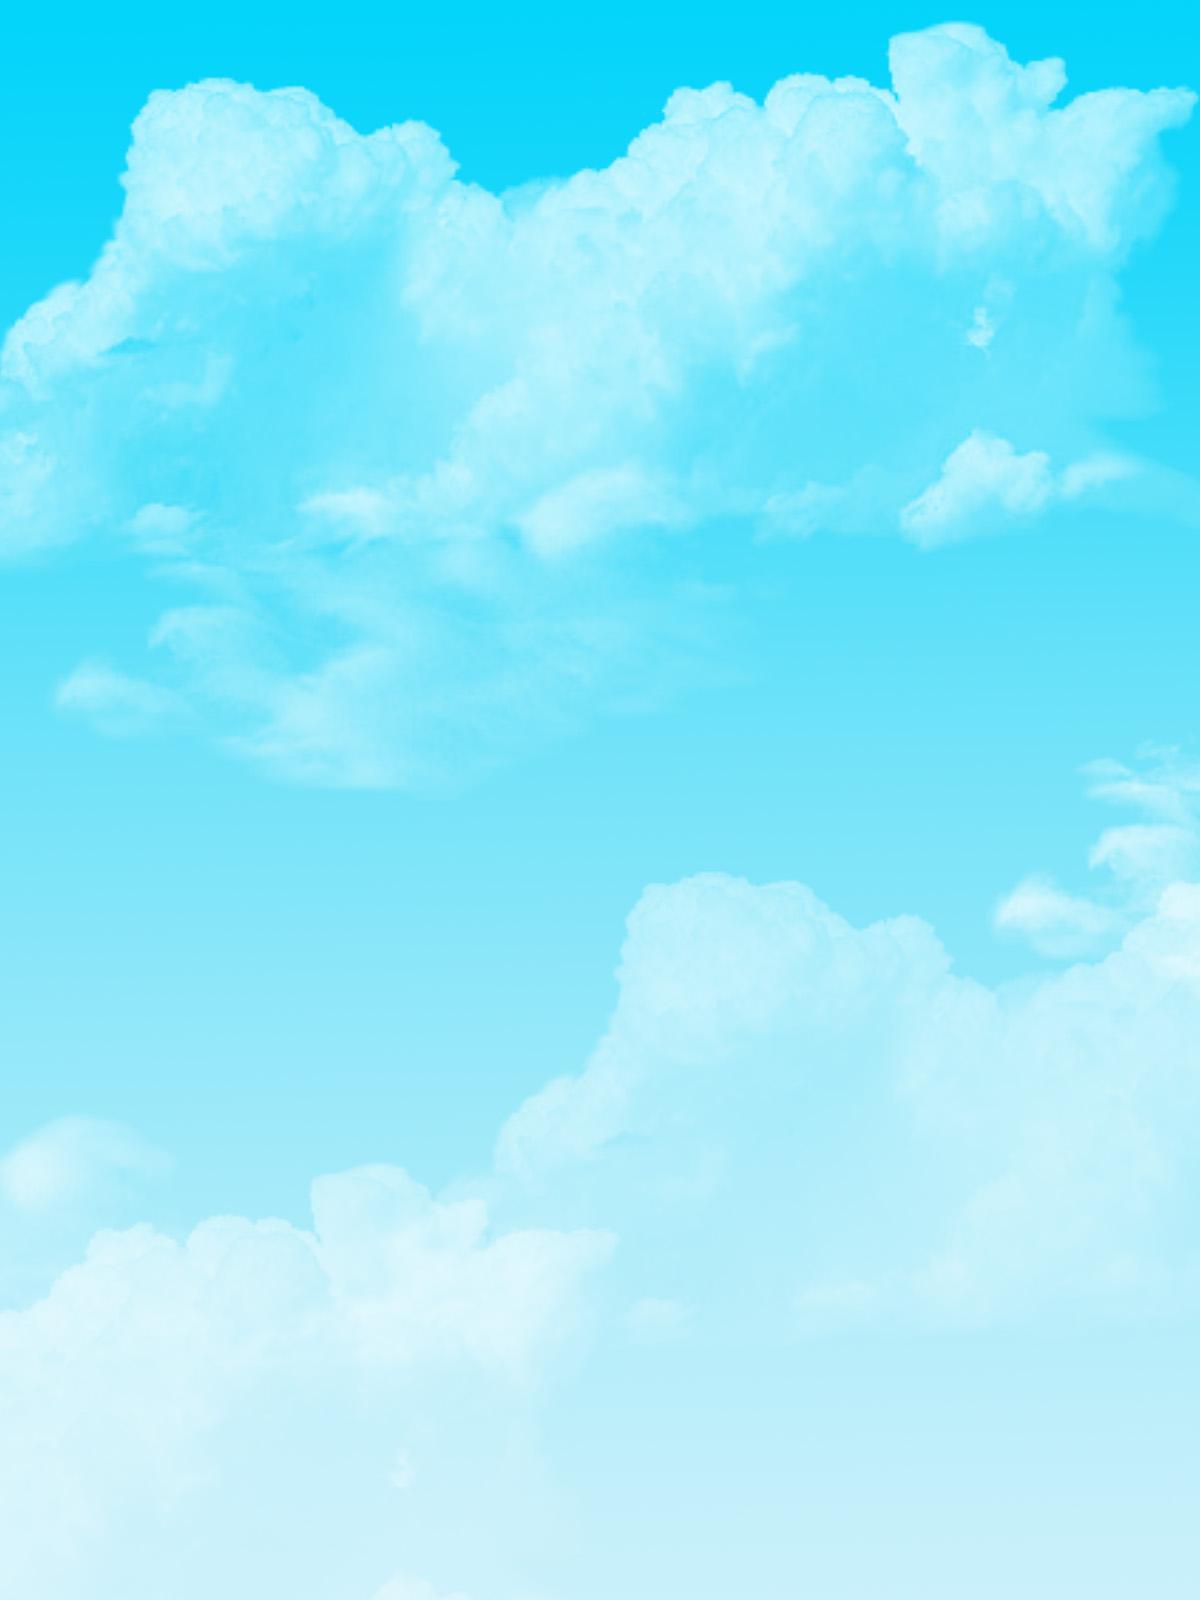 Simple Cloud Background by YuniNaoki 1200x1600